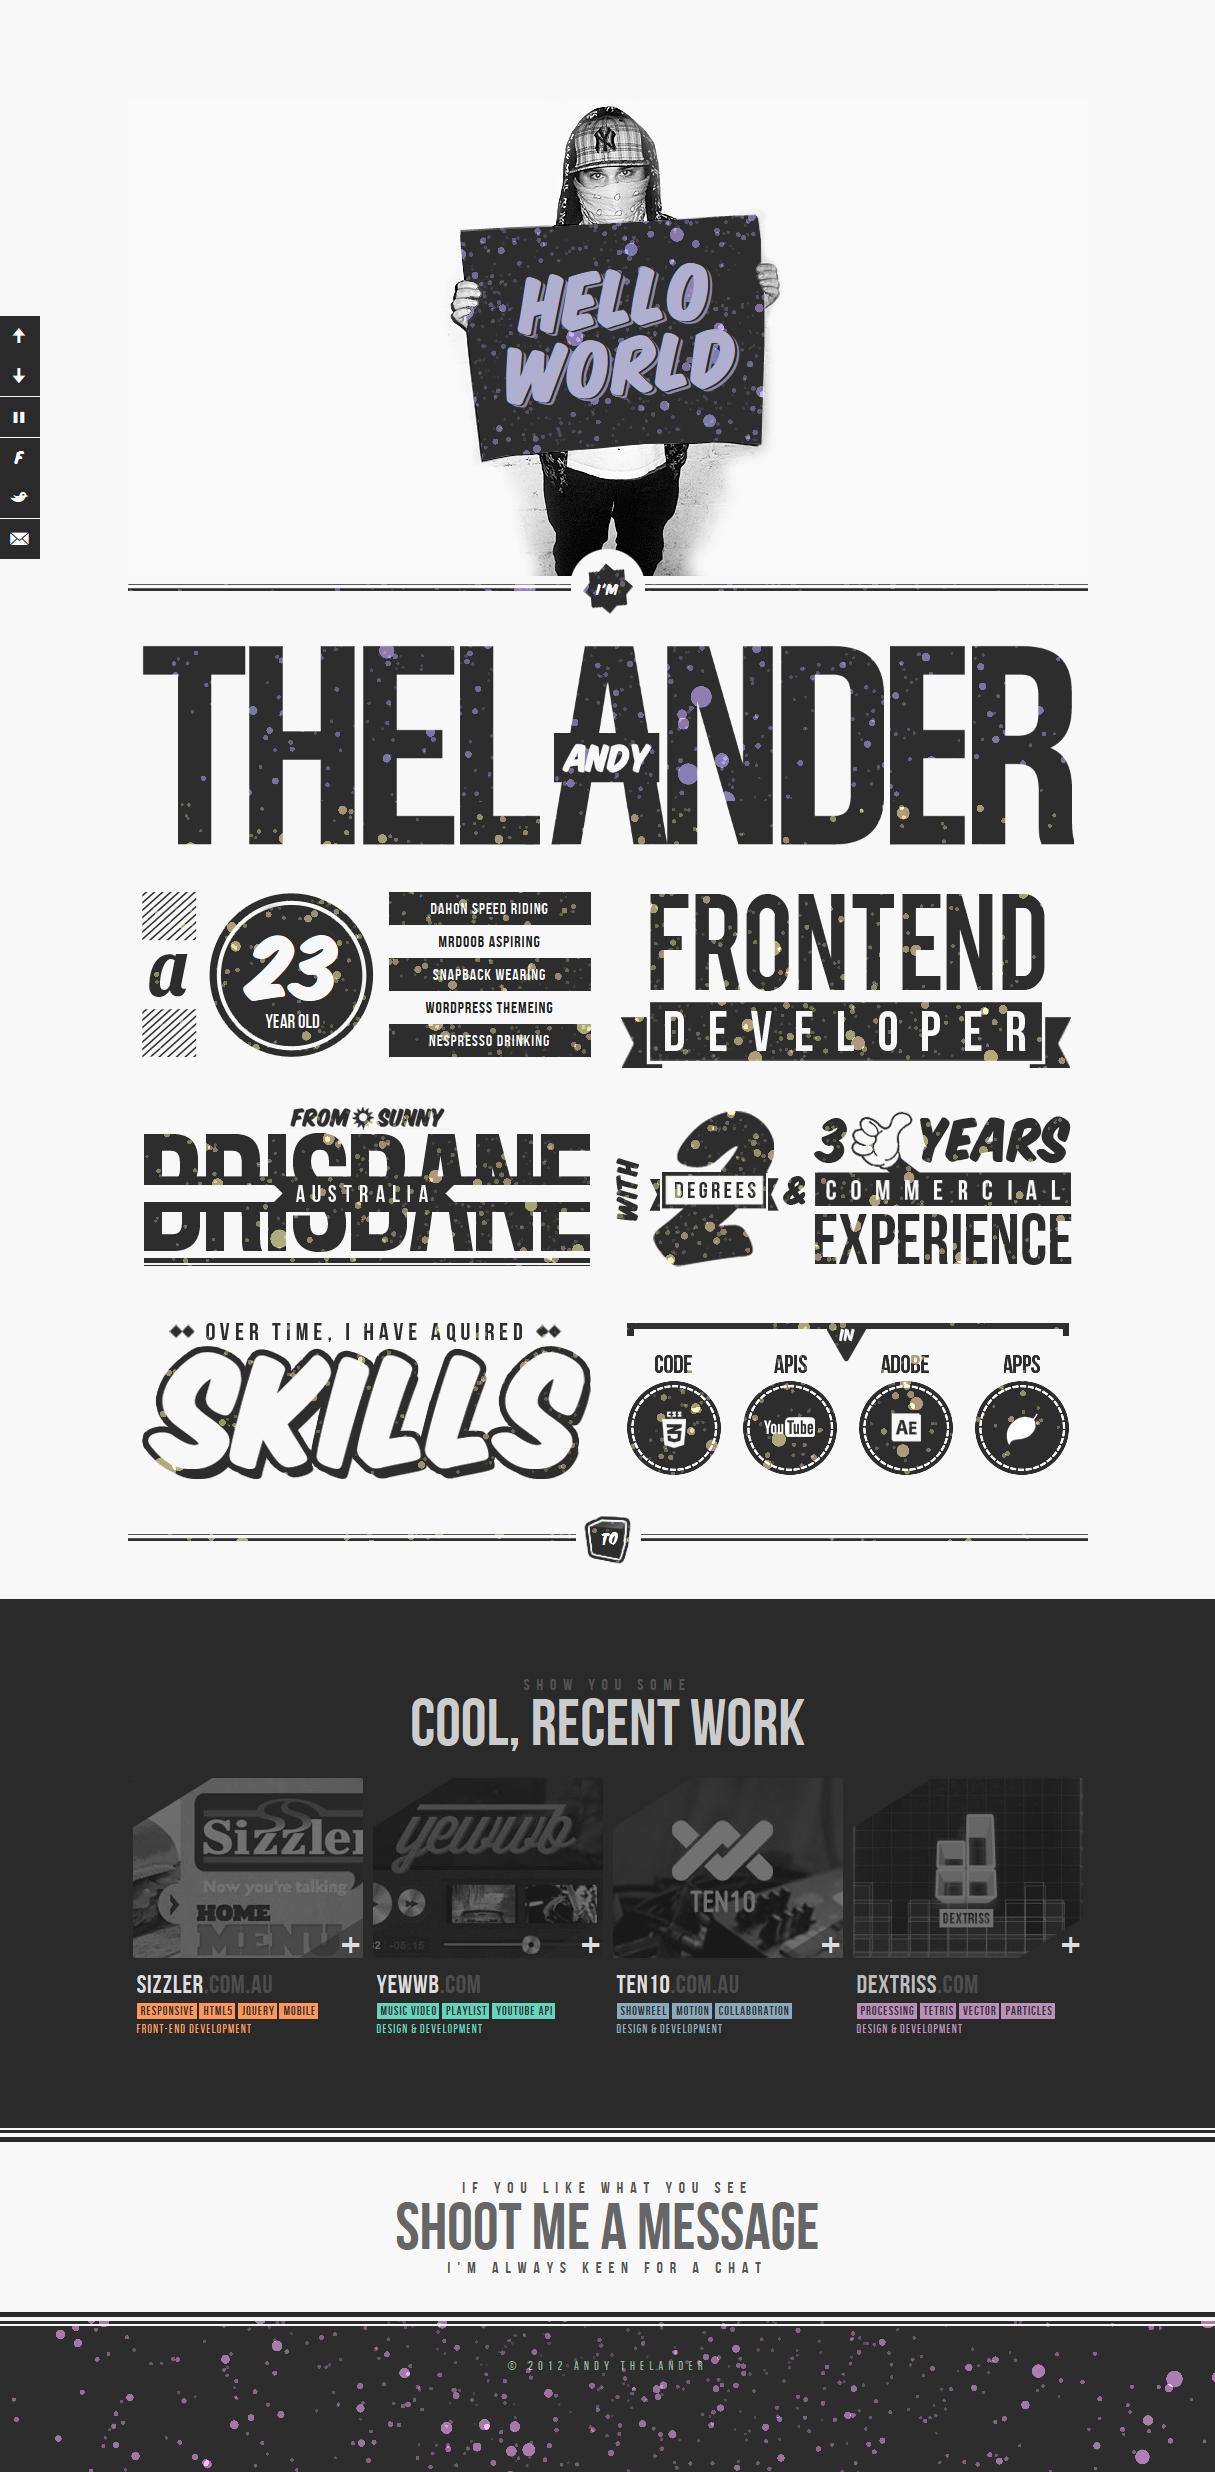 http://thelanded.com/